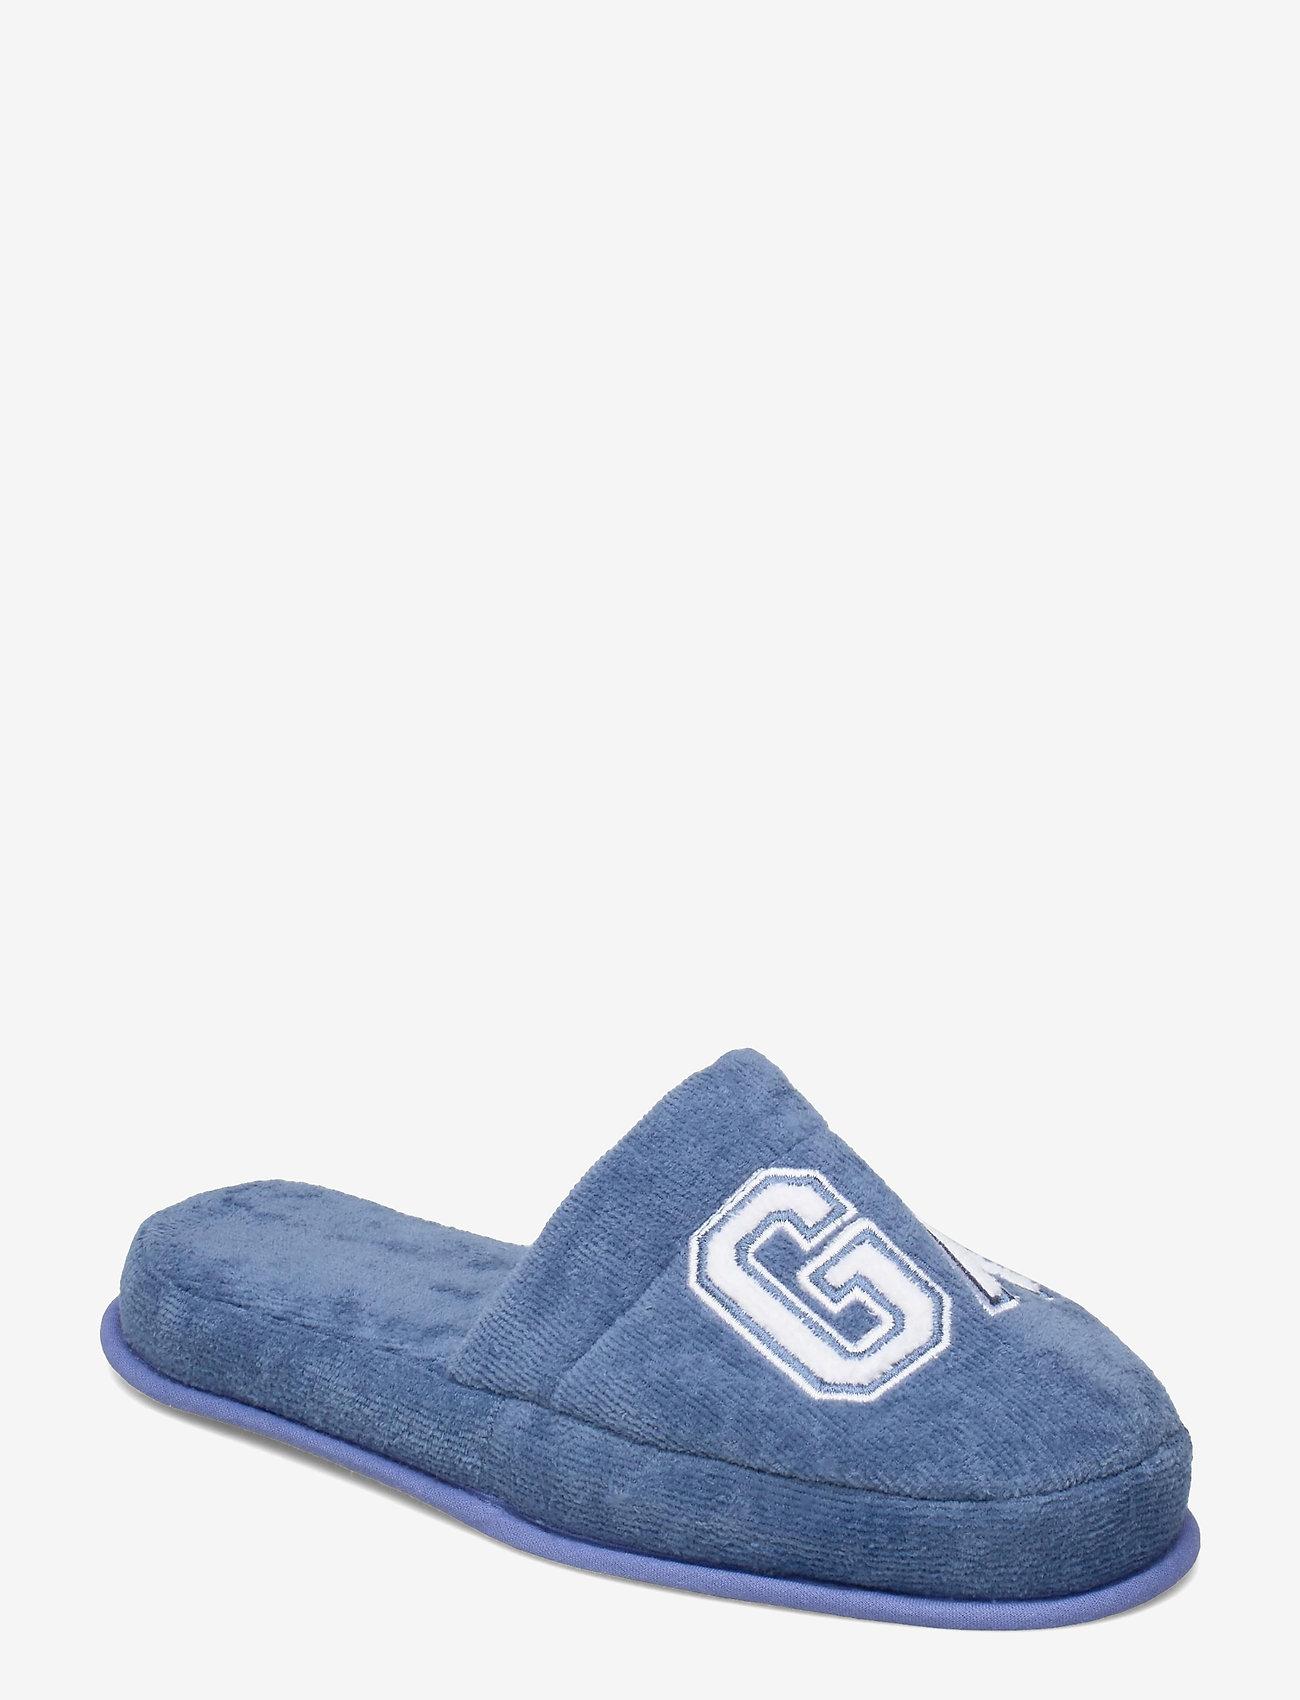 GANT - VACAY SLIPPERS - odzież - moonlight blue - 0